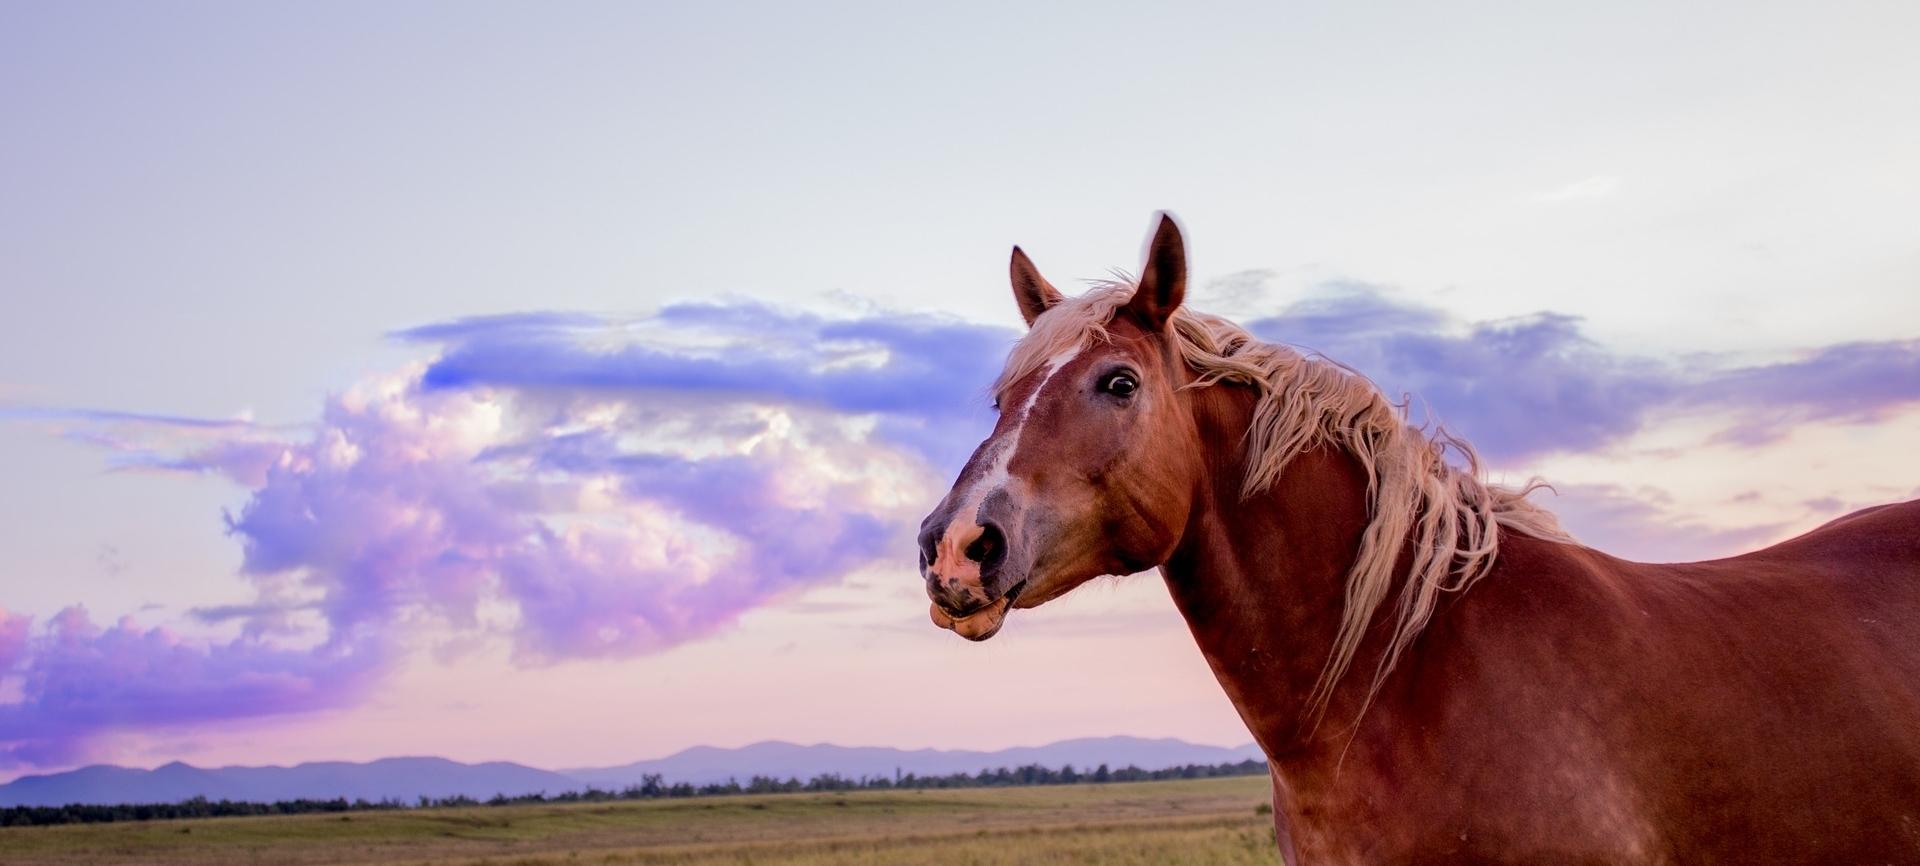 horse-3444010_1920.jpg